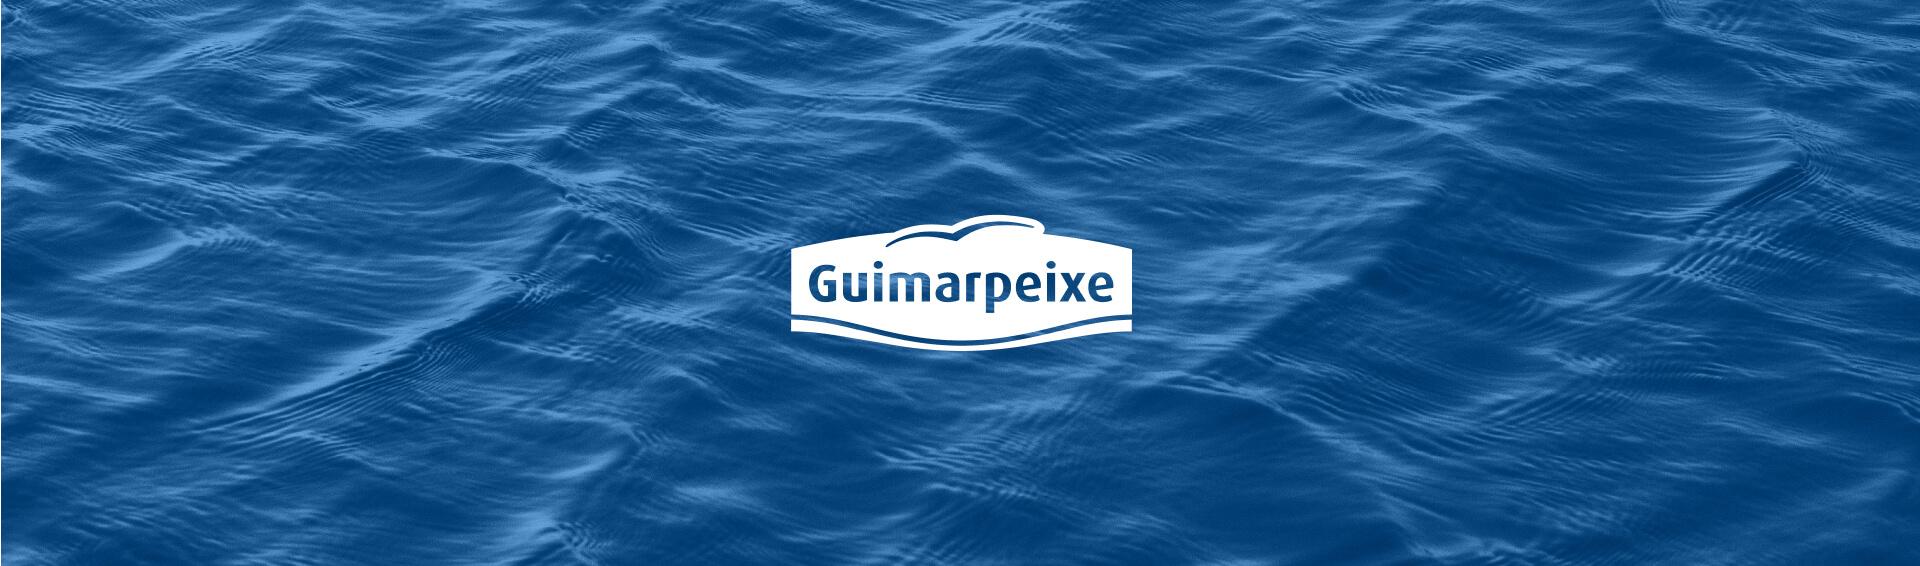 Logo da Guimarpeixe sob background do mar